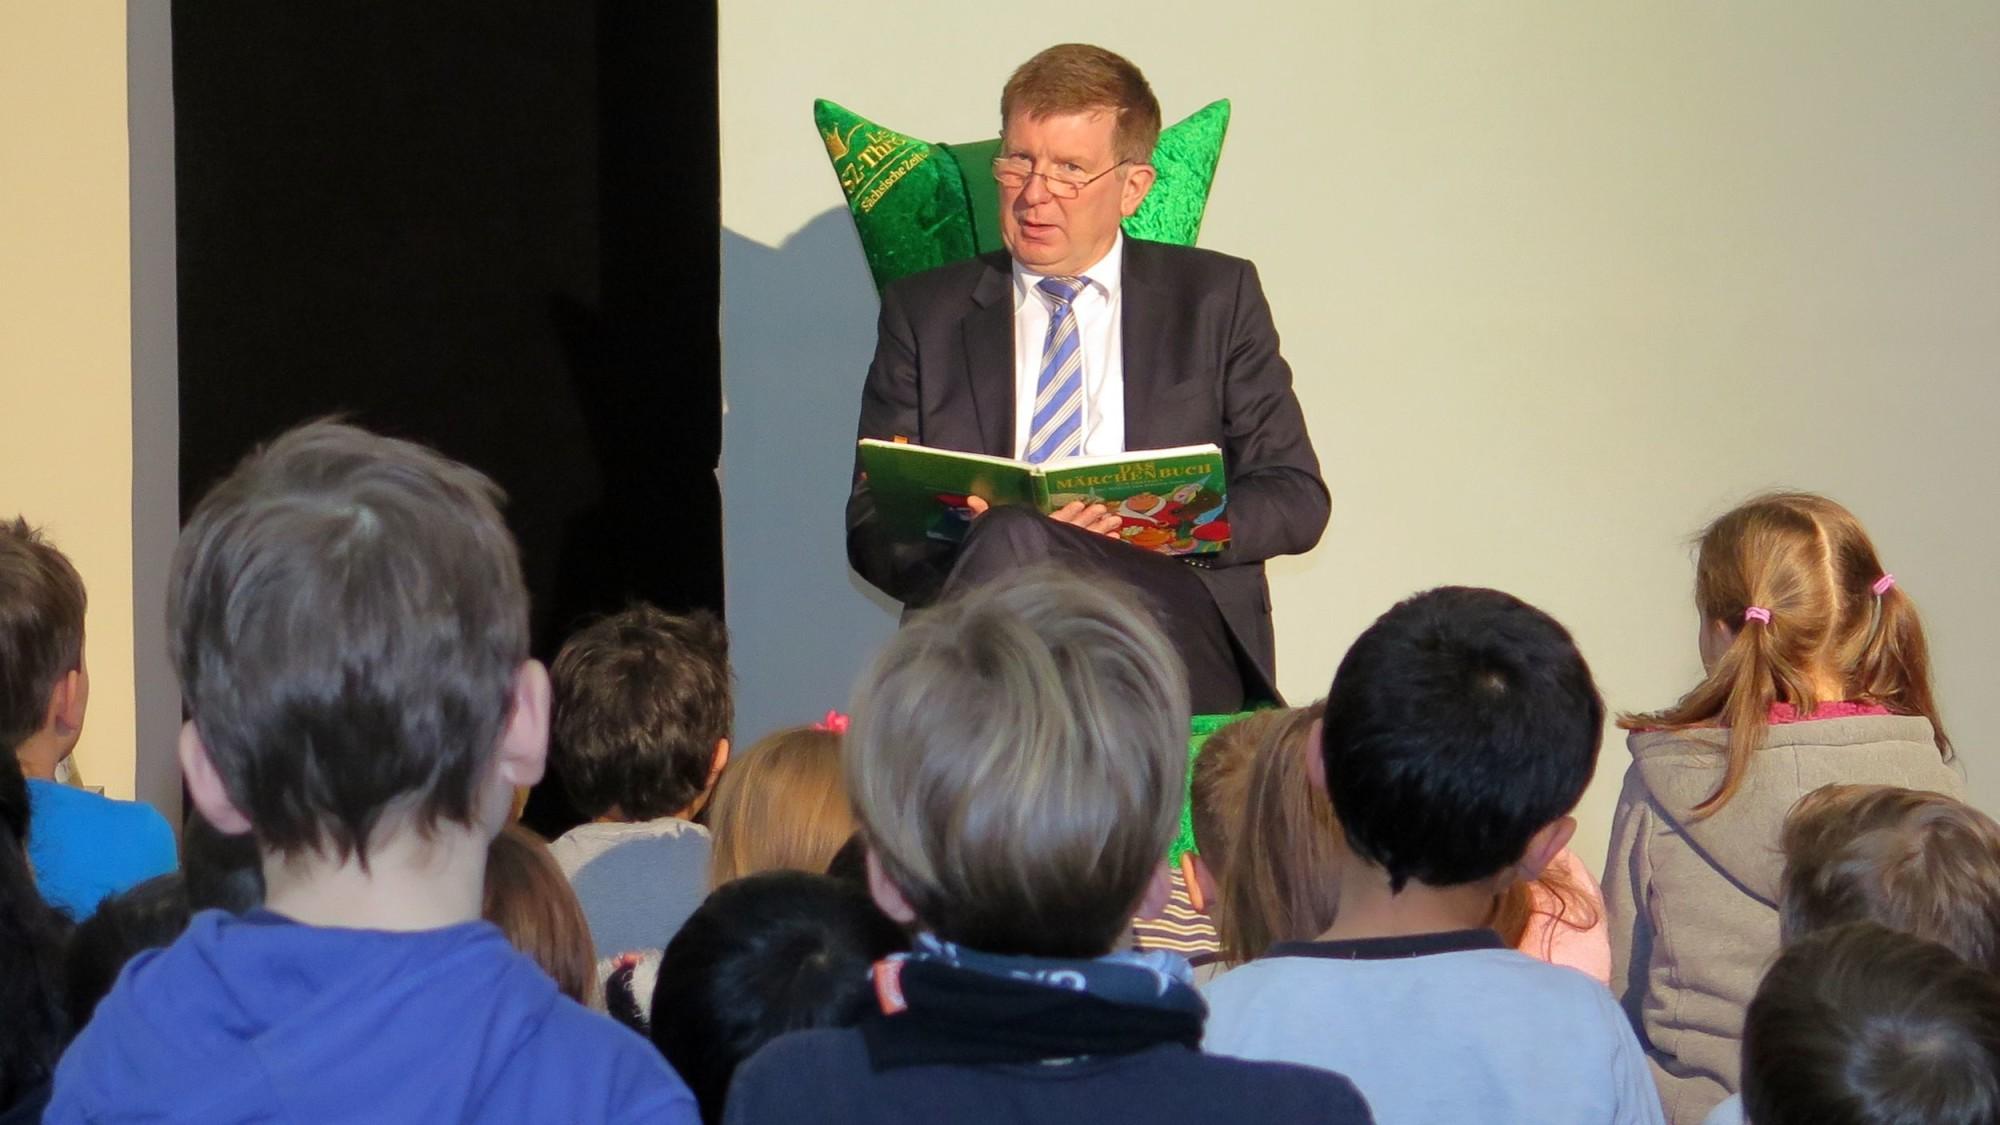 Staatssekretär Frank Pfeil liest Flüchtlingskindern vor.